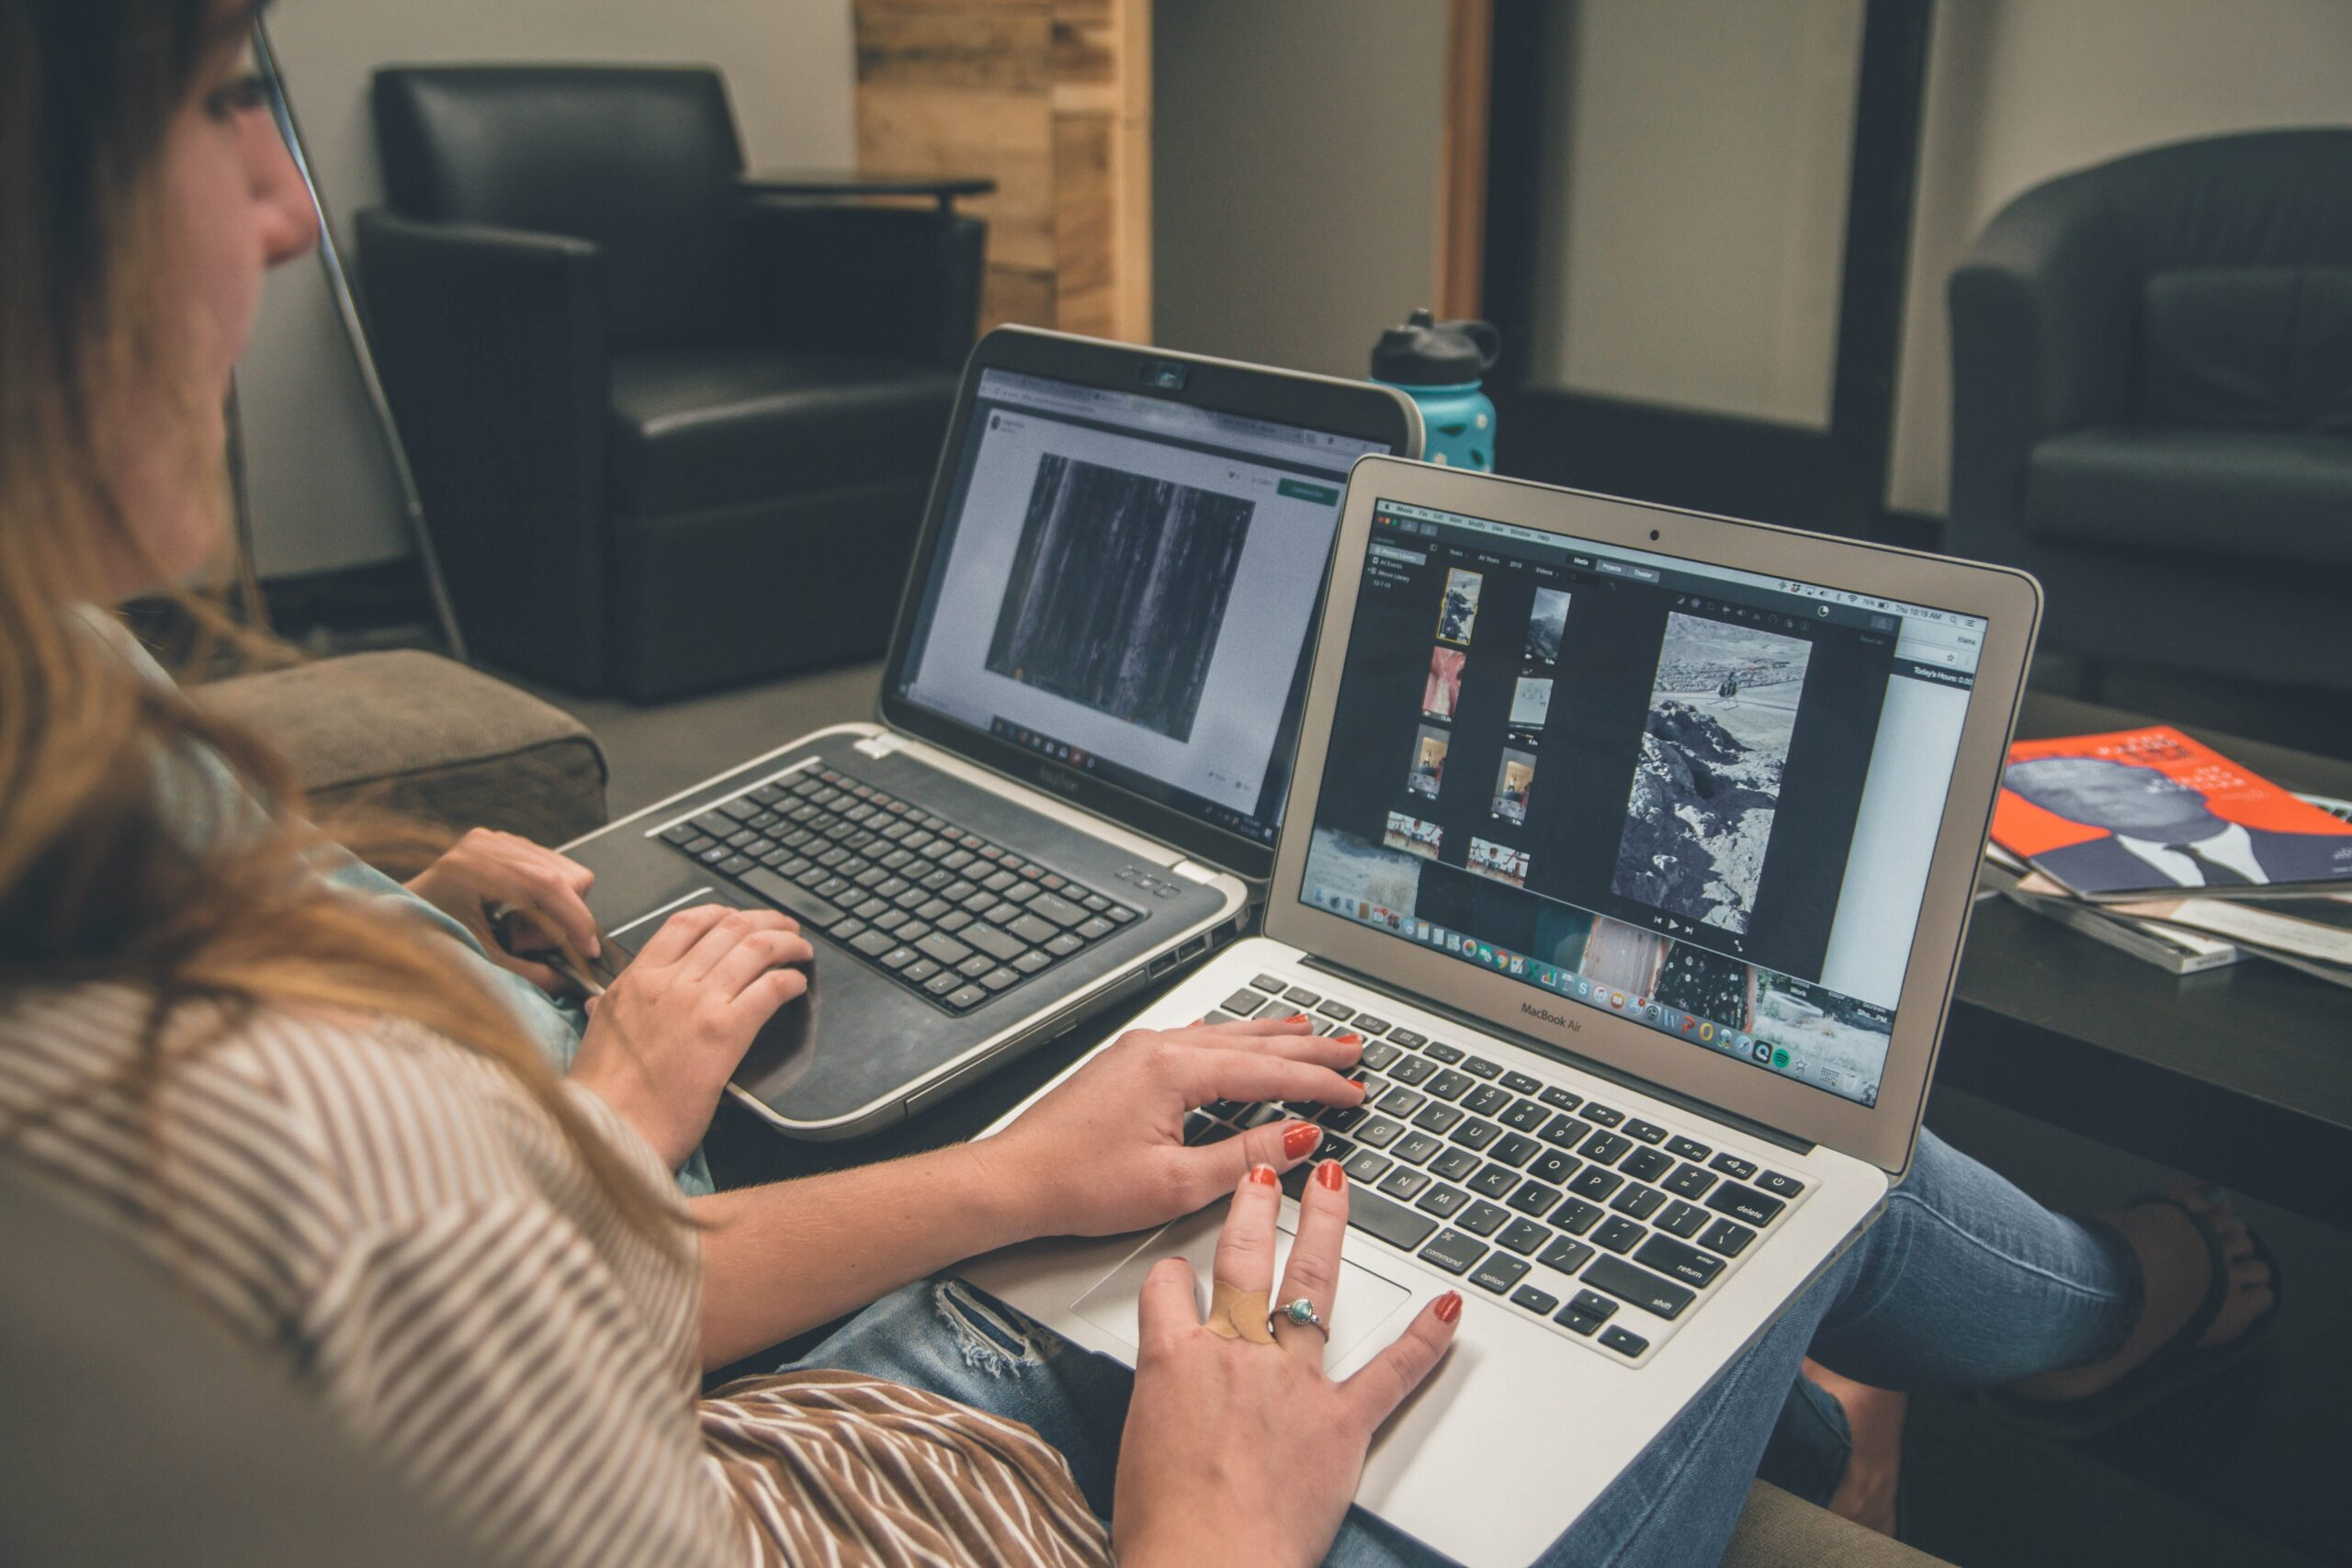 tips and tricks di Marketing Digitale - parte 2